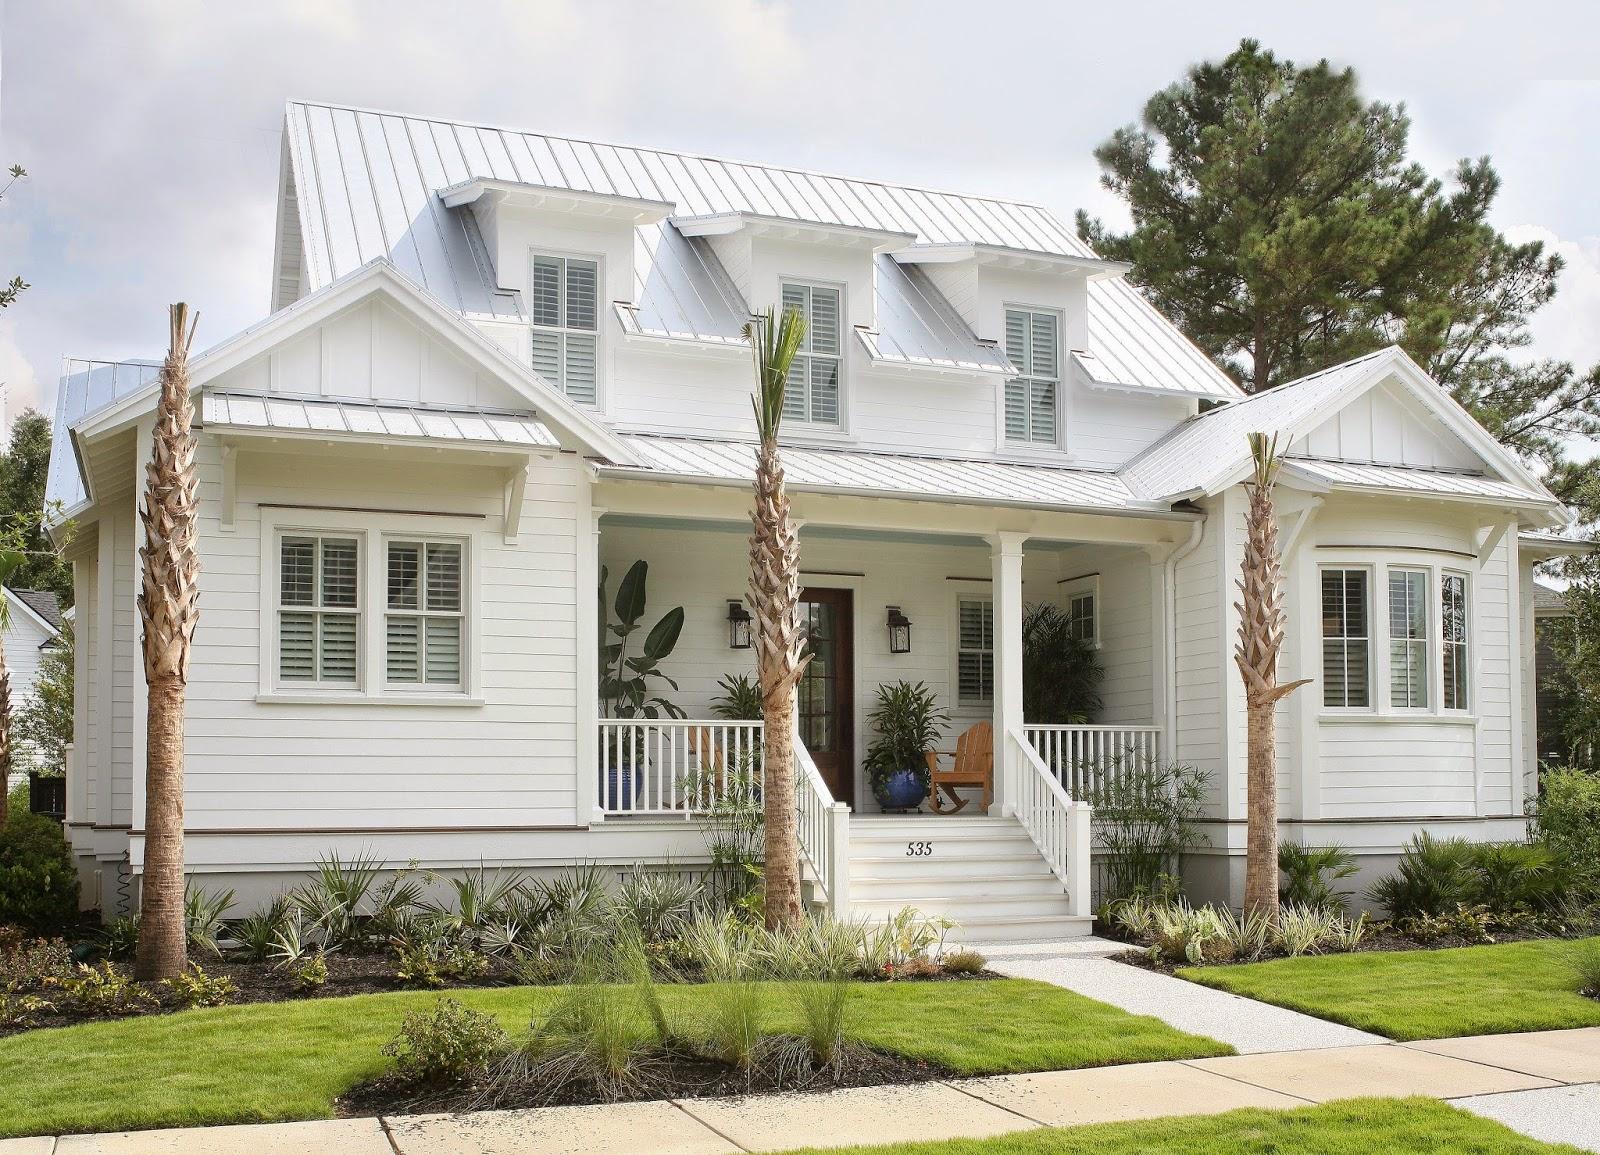 House Plan: Dewees Breeze By Flatfish Island Designs